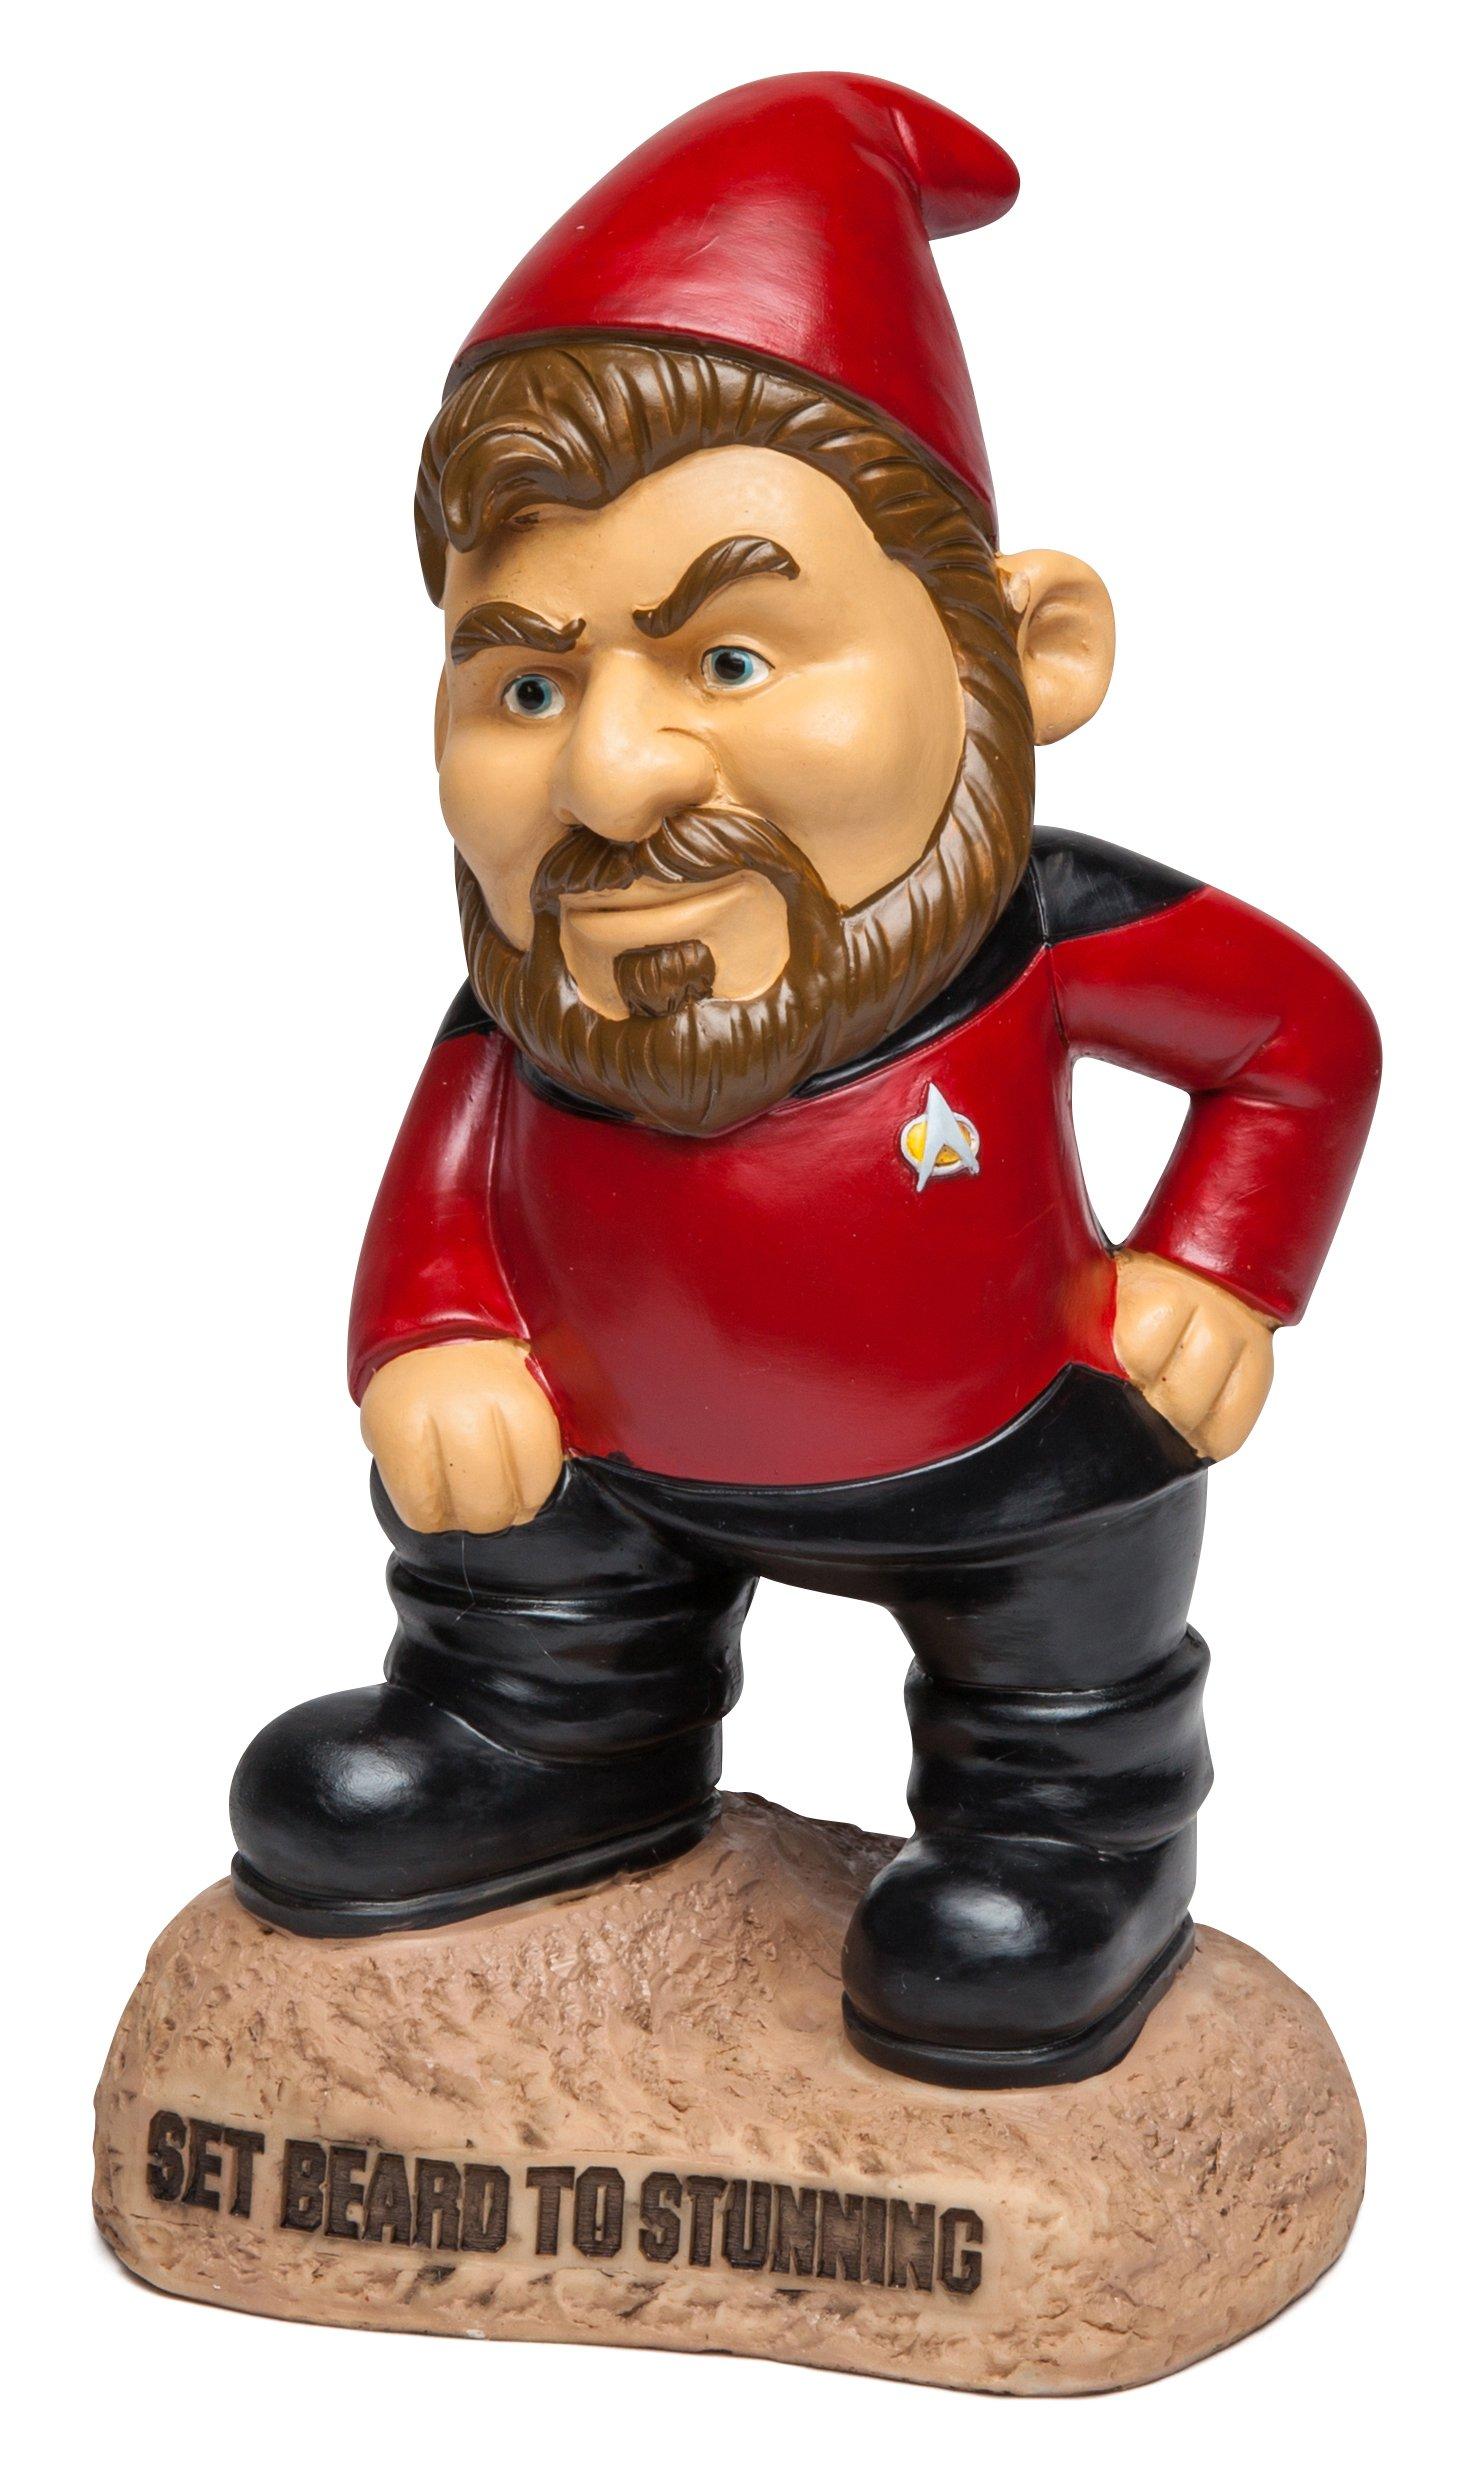 BigMouth Inc Star Trek Garden Gnome, Riker Statue, Set Beard to Stunning Saying, Star Trek Lawn Decor, Outdoor Statue …